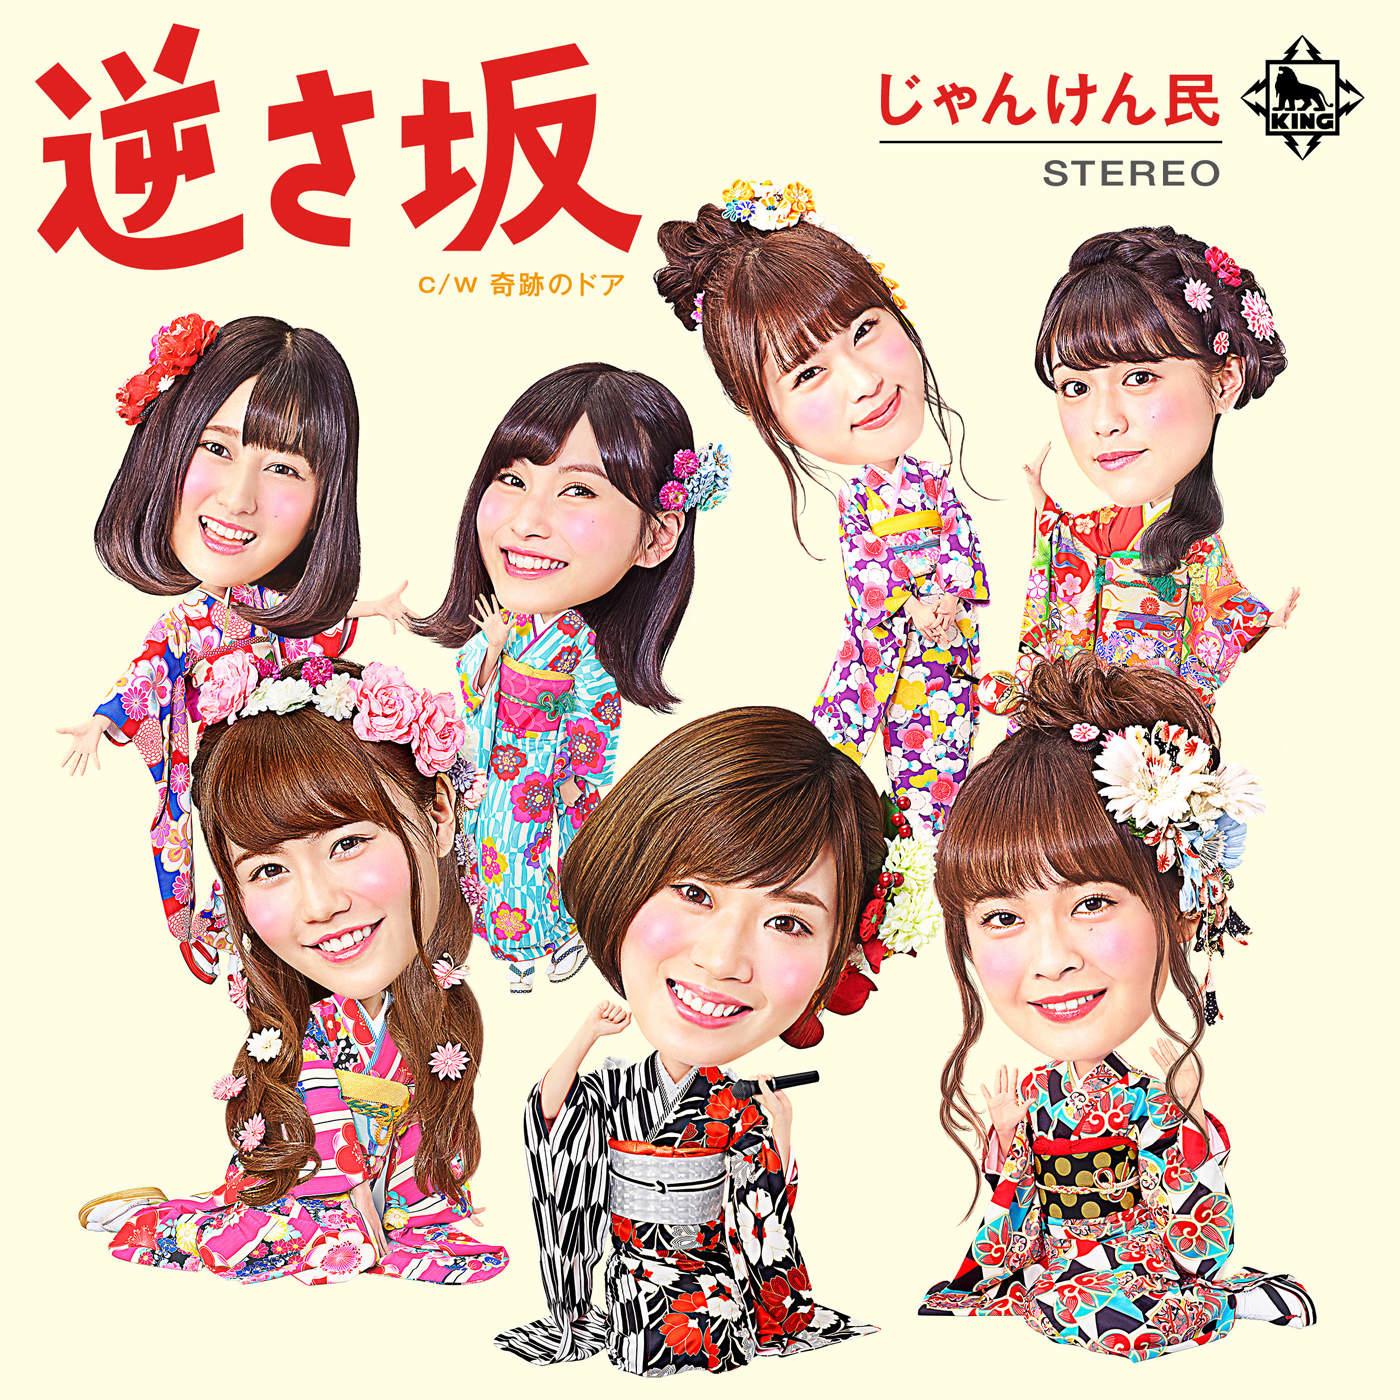 20161228.07.41 AKB48 (Jankenmin) - Sakasazaka cover.jpg